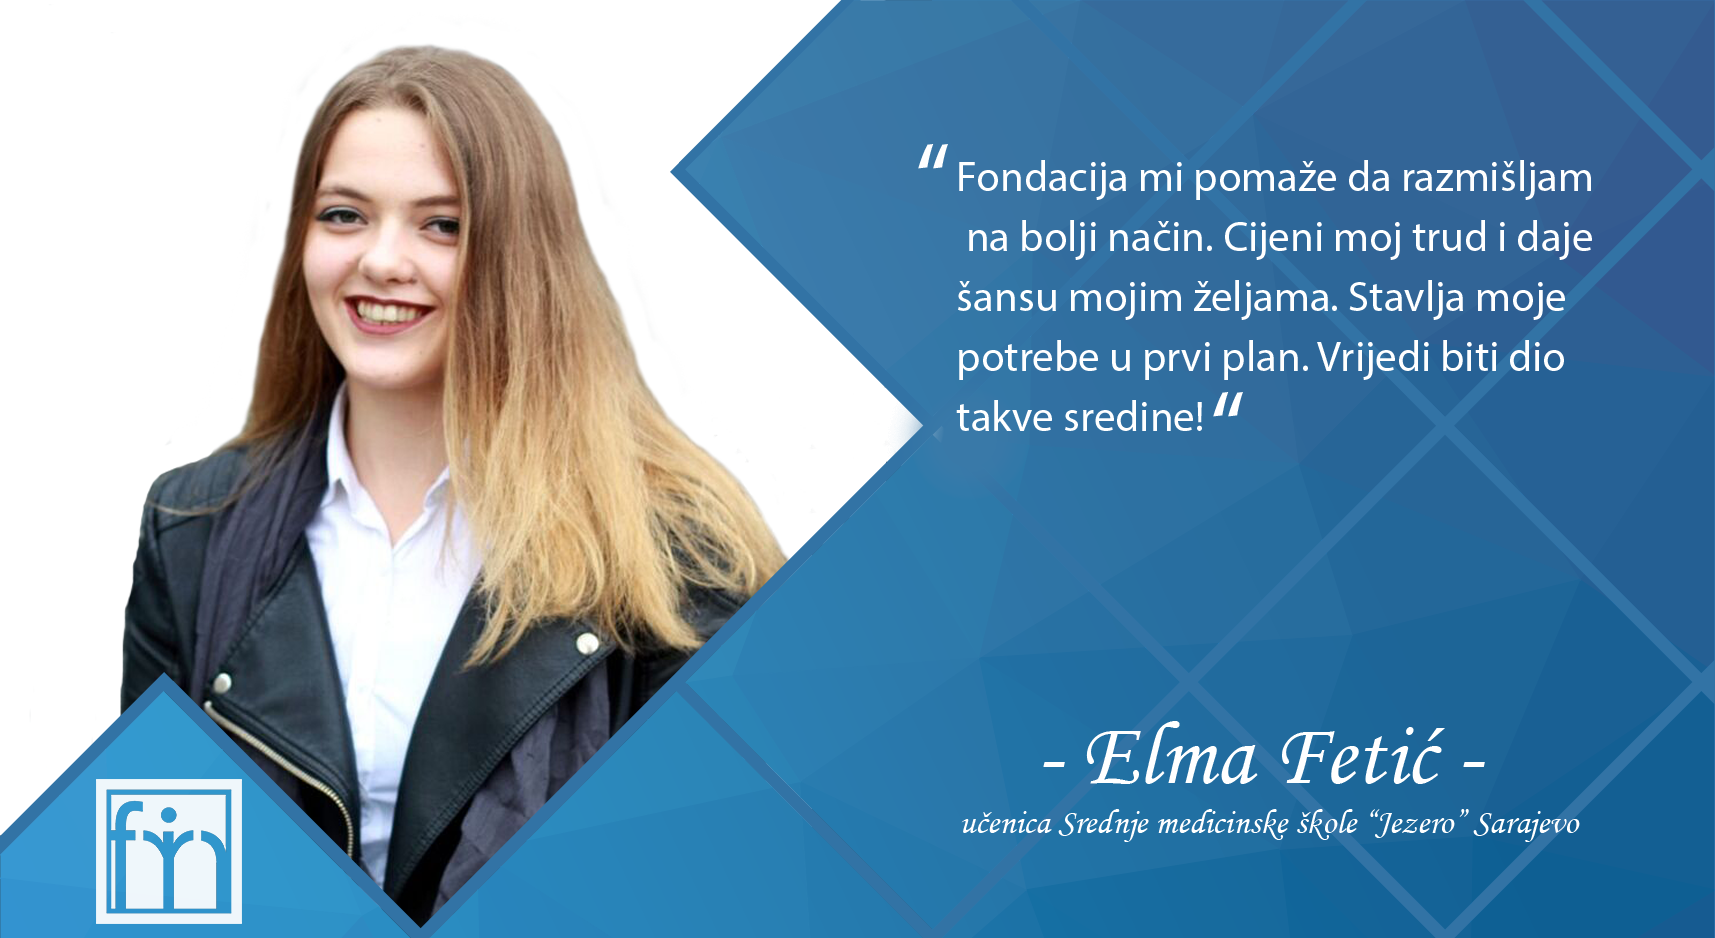 Elma_Fetic_Izvor_nade